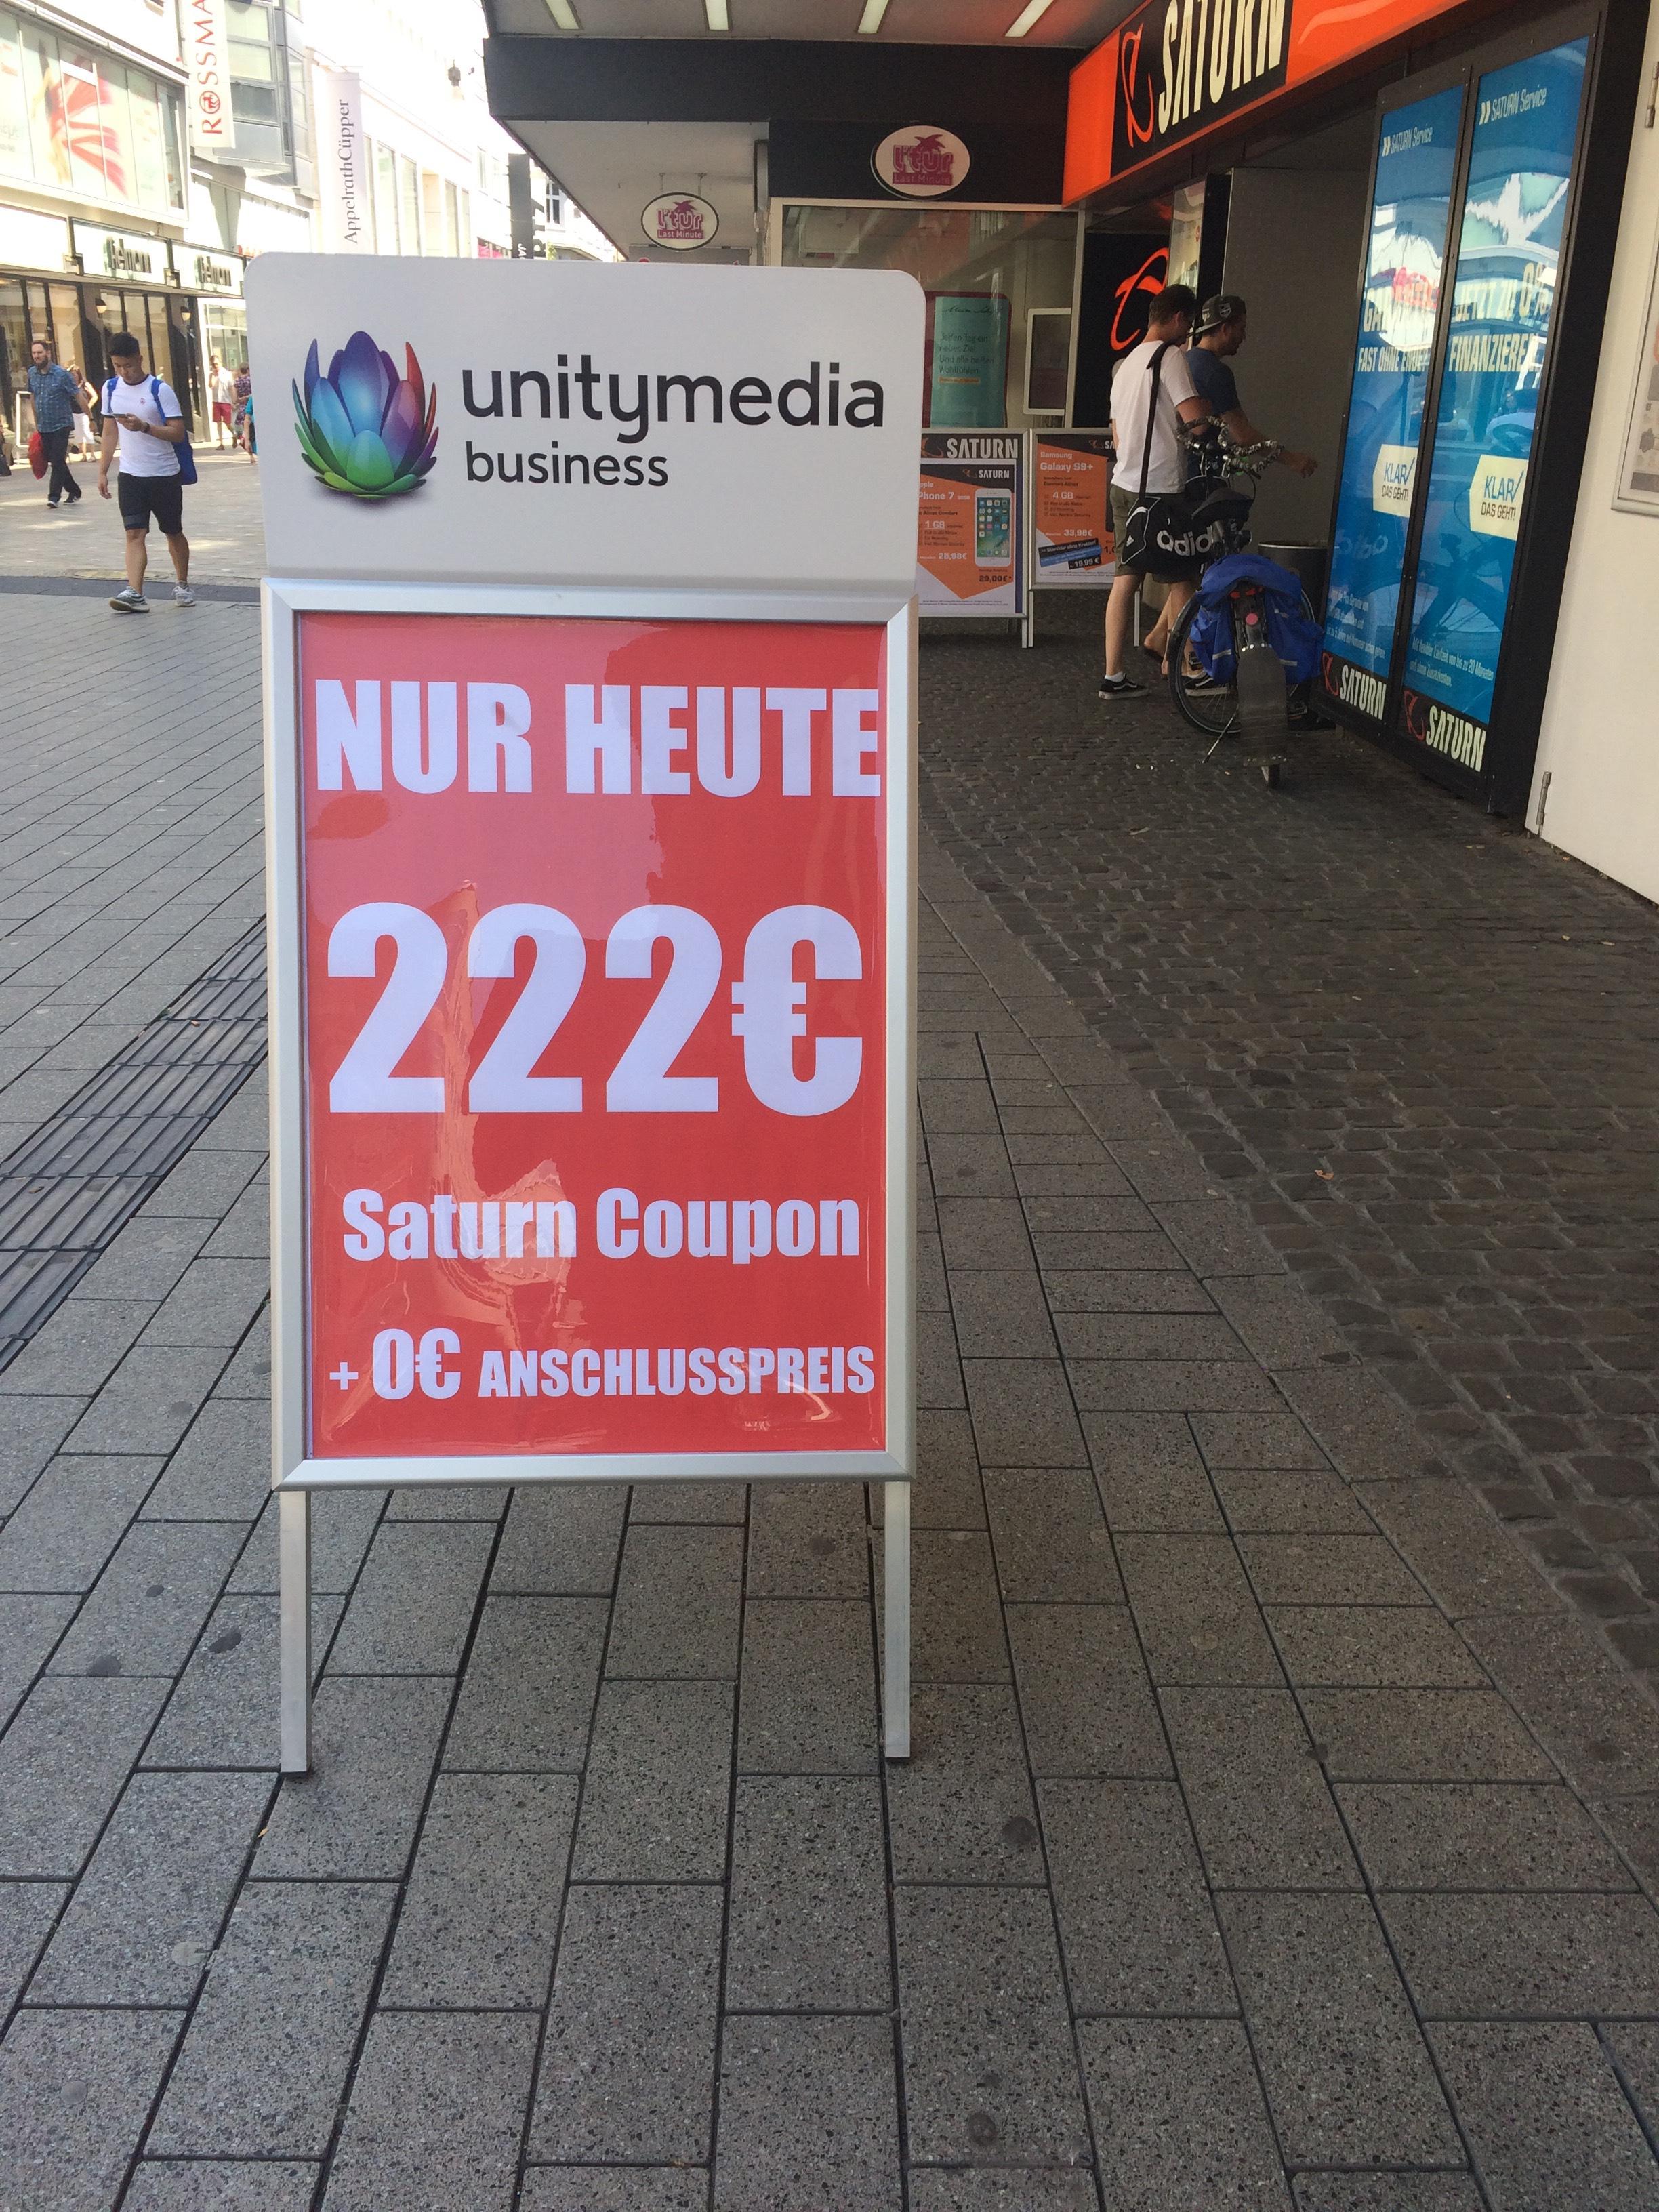 Unitymedia Aktion 222€ Coupon + Ohne Anschlusspreis (Lokal) Saturn Dortmund